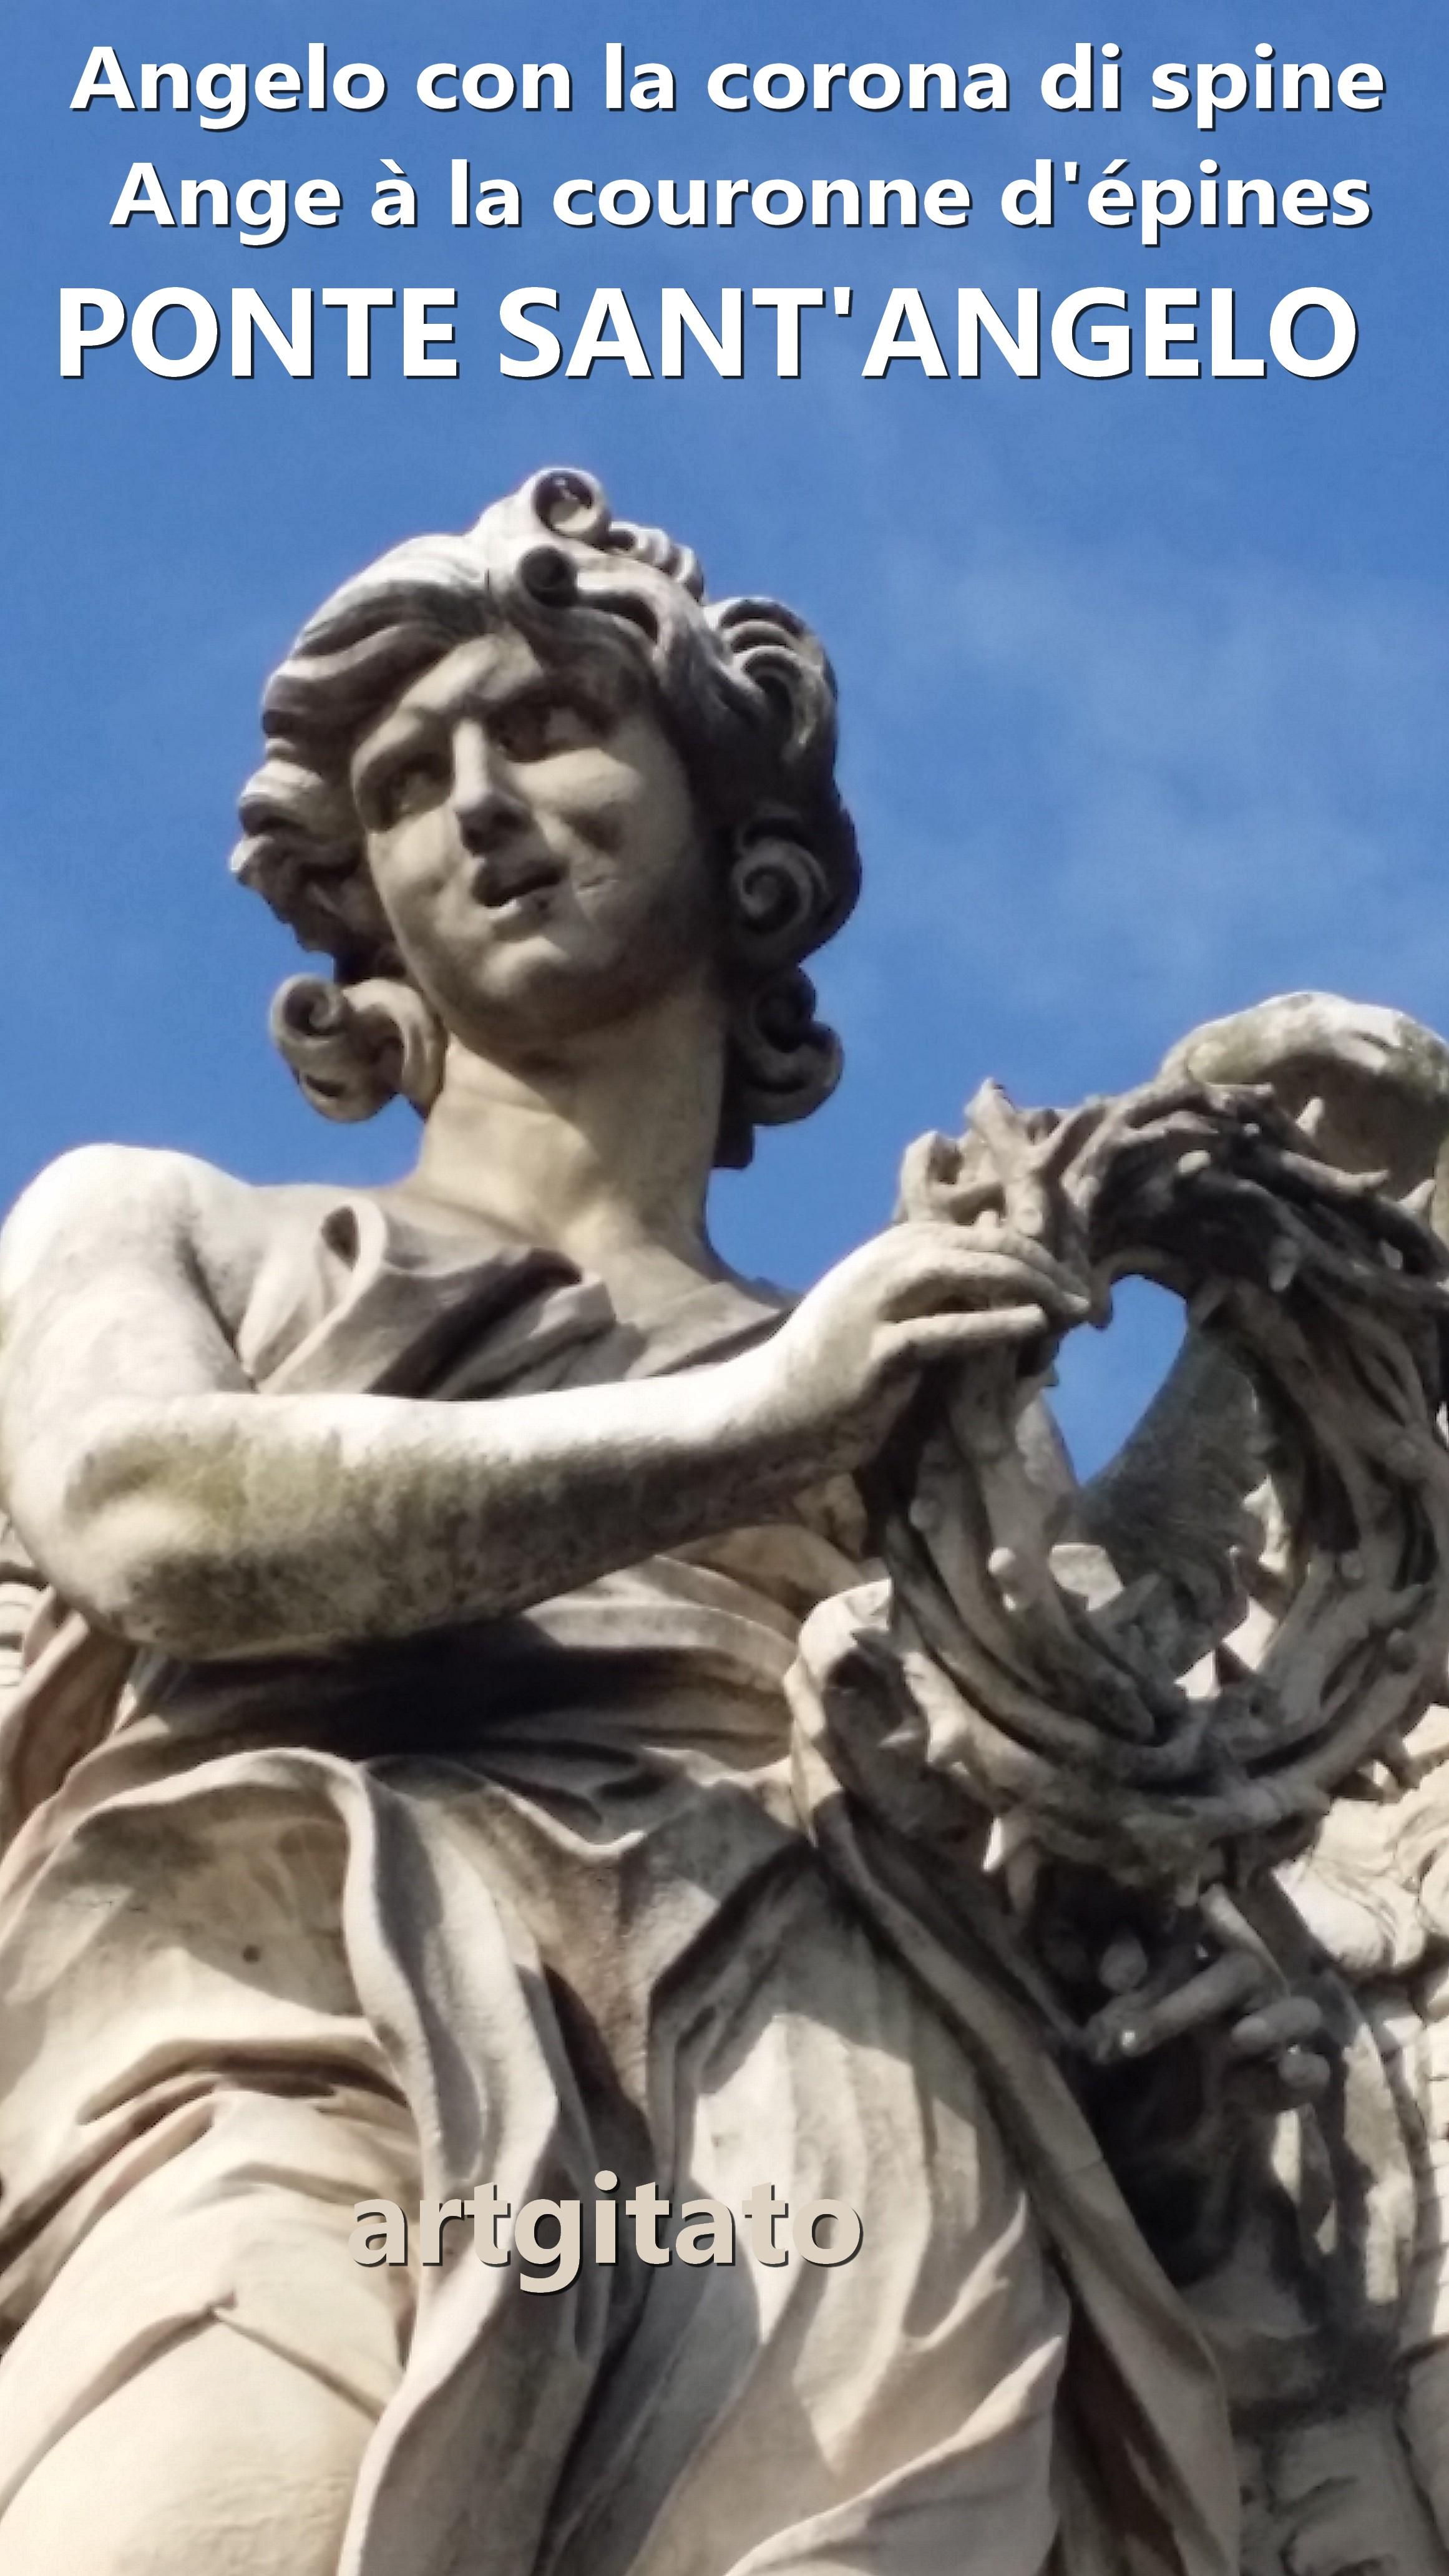 Ponte Sant'Angelo Pont Saint Ange artgitato Rome Roma Angelo con la corona di spine 1